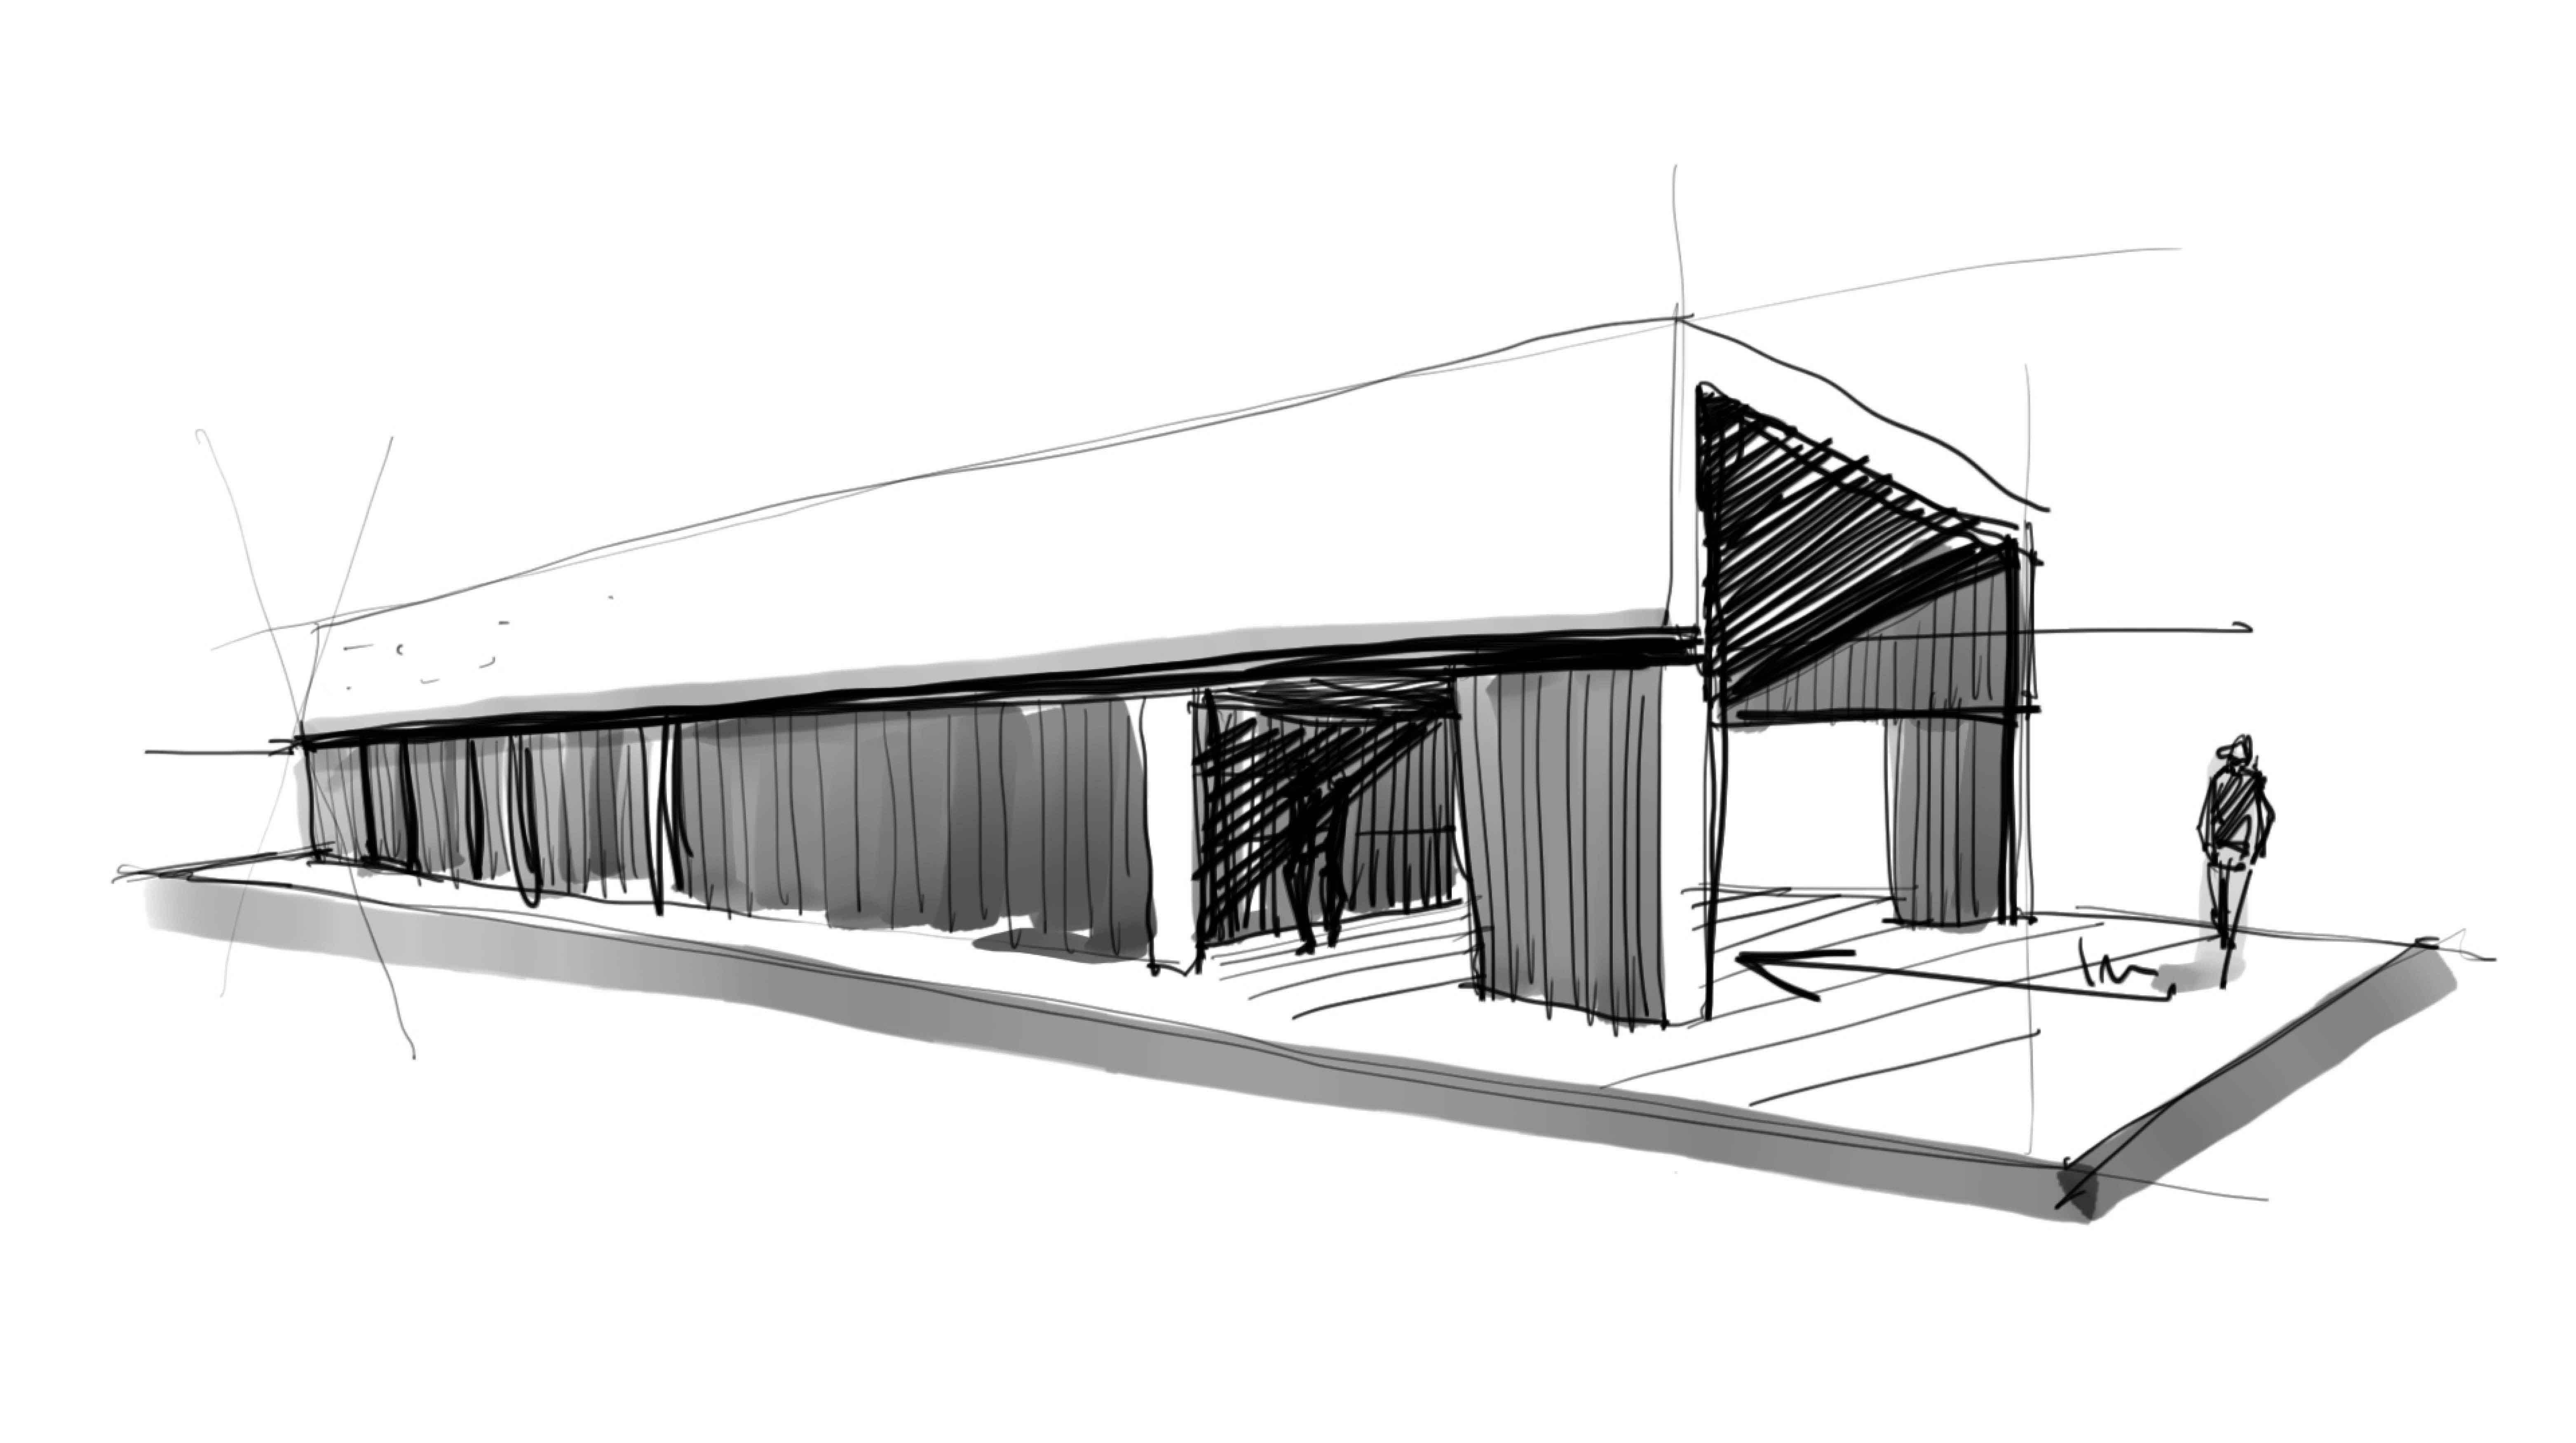 uSafe Lab - Sketch Binini Partners - Archilinea